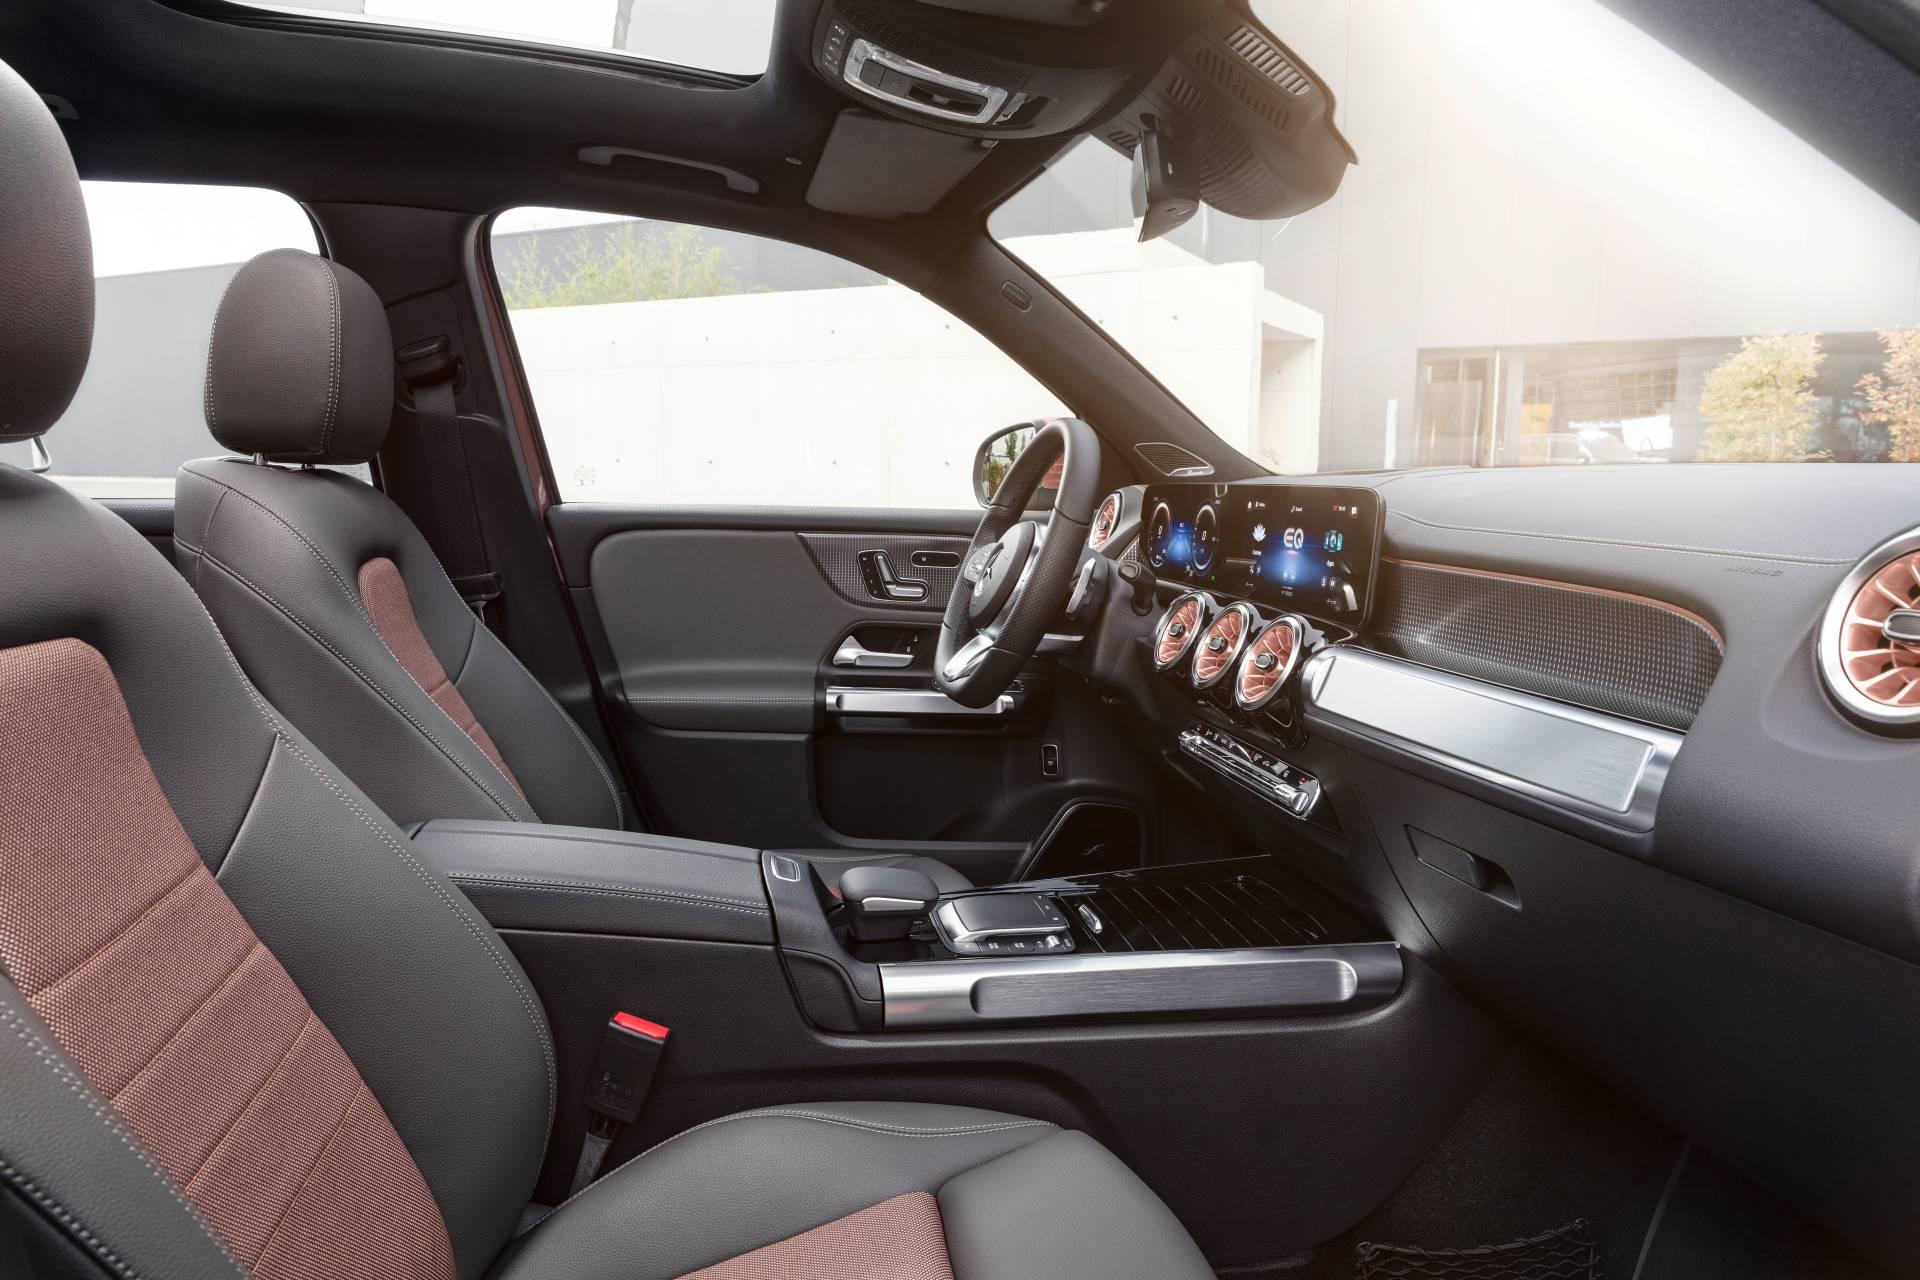 Mercedes-EQ, EQB, X 243, 2021Mercedes-EQ, EQB, X 243, 2021